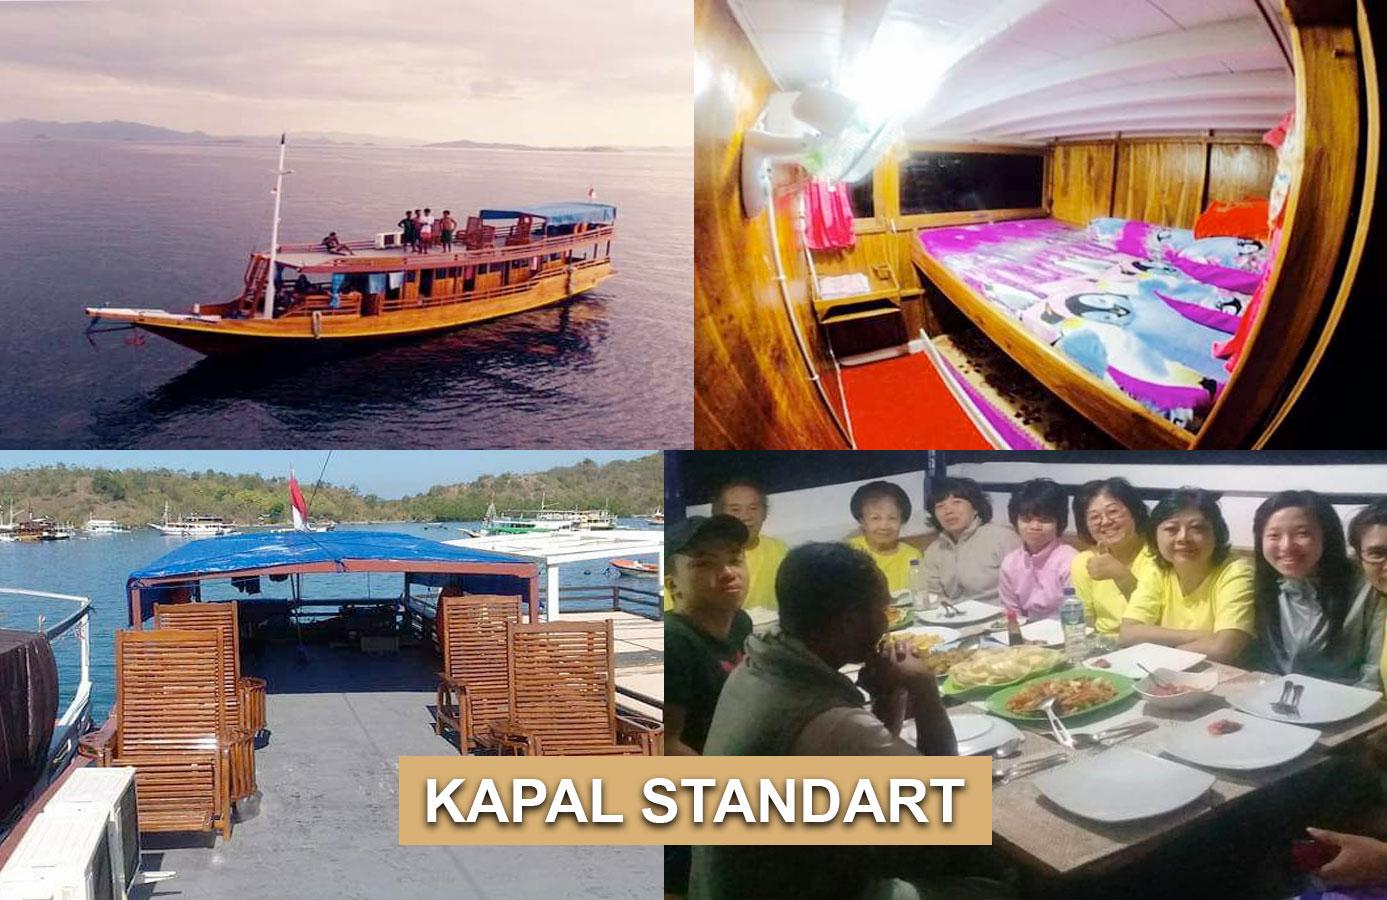 kapal-standart